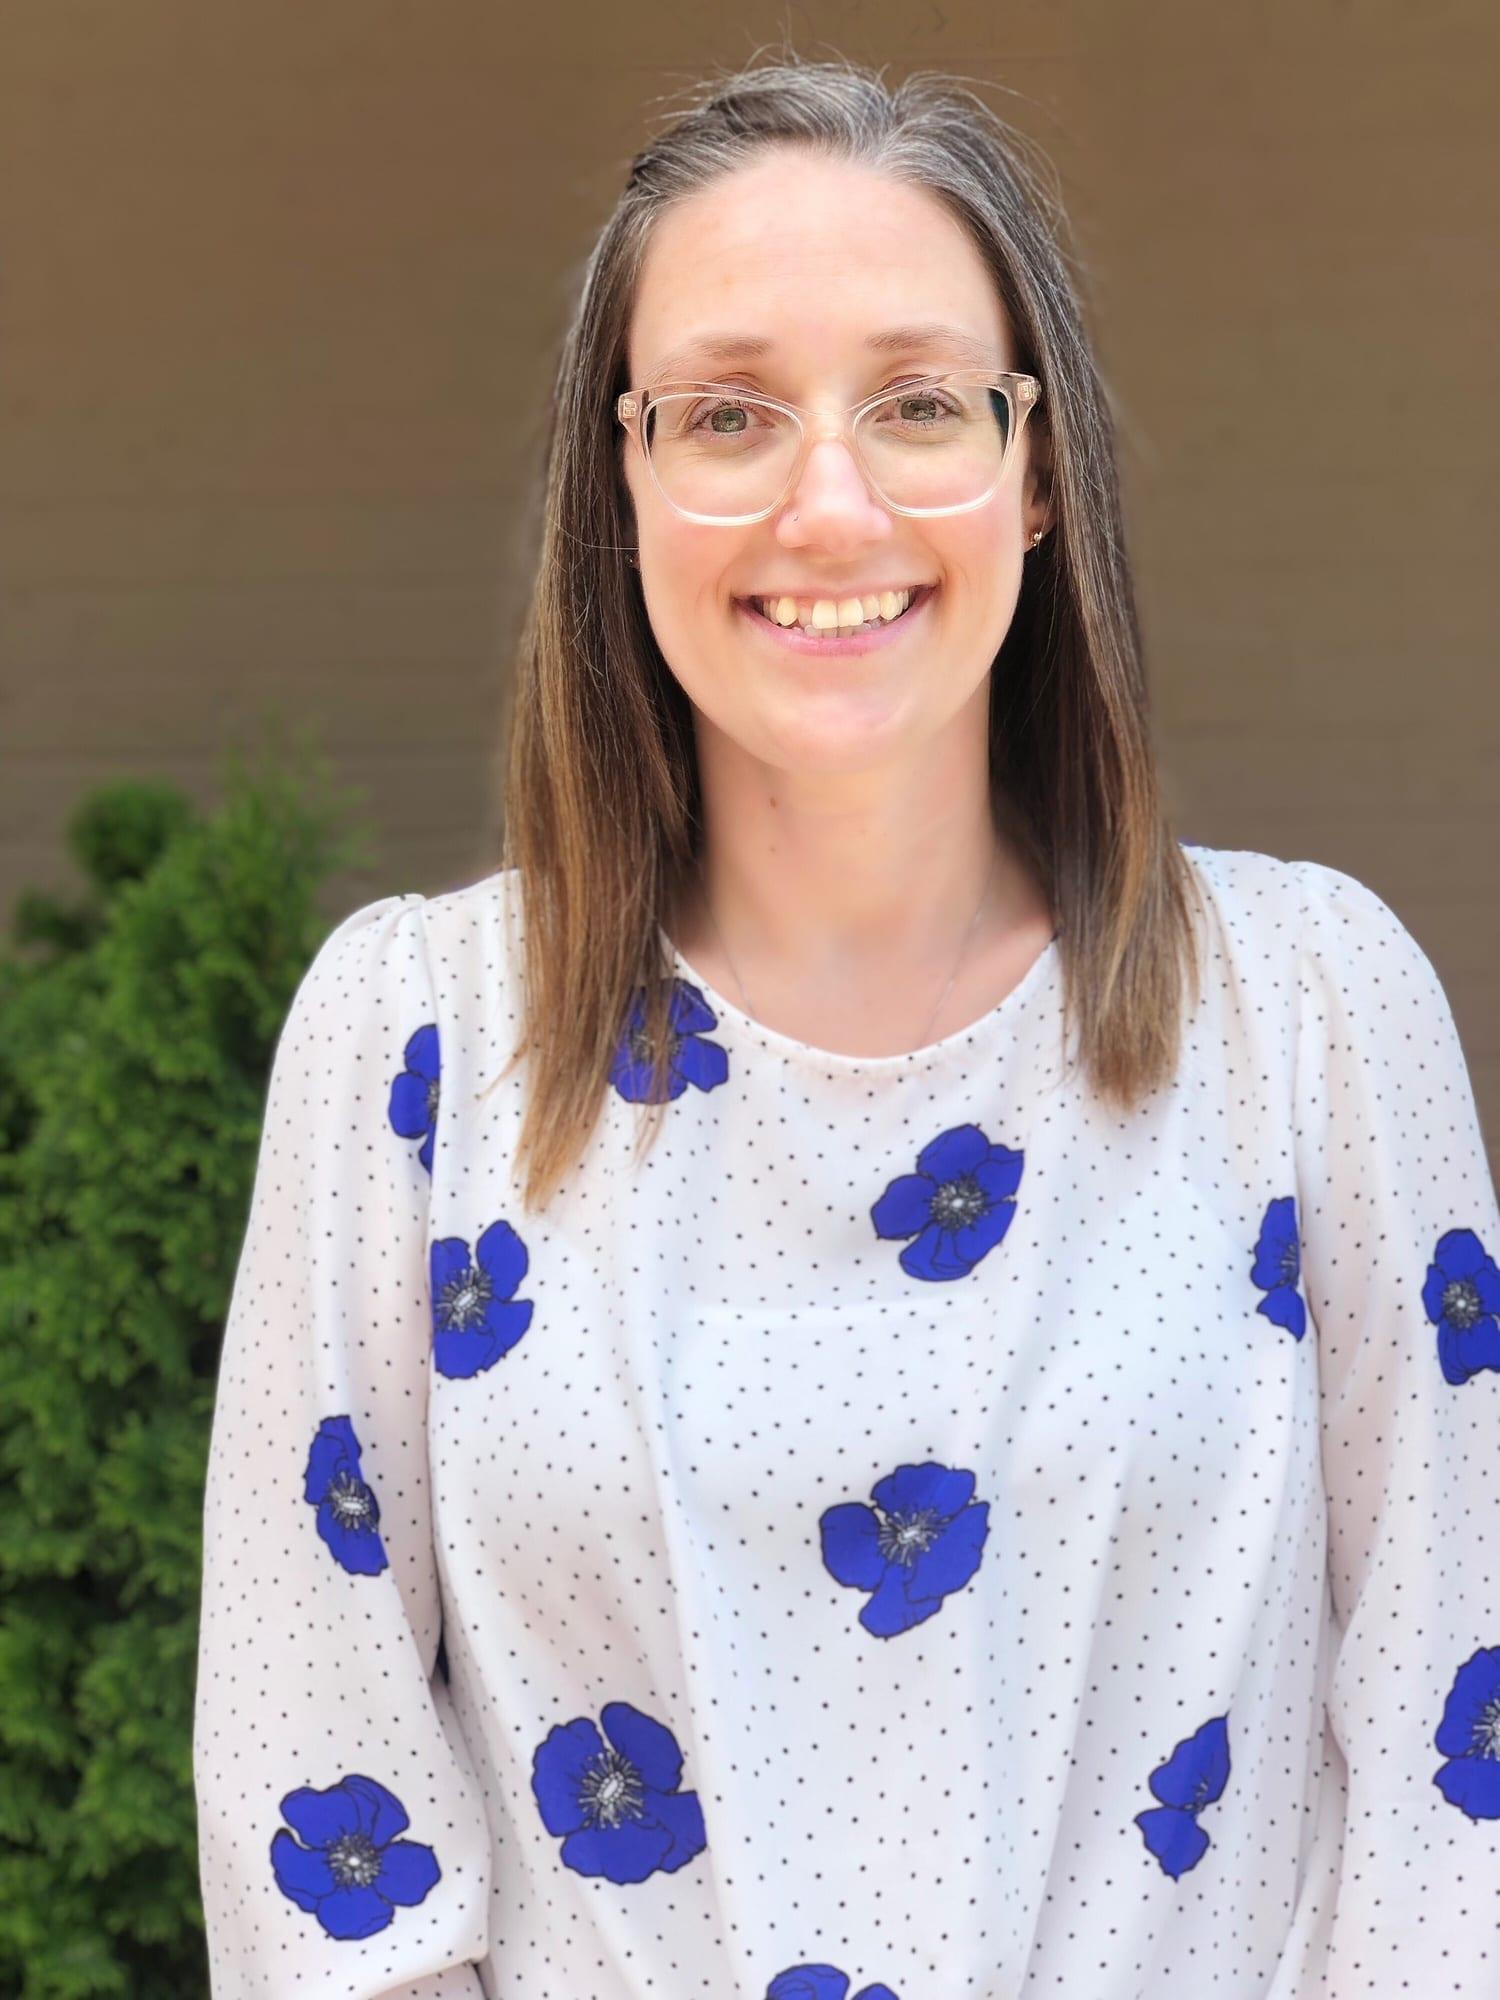 Katie Porchak